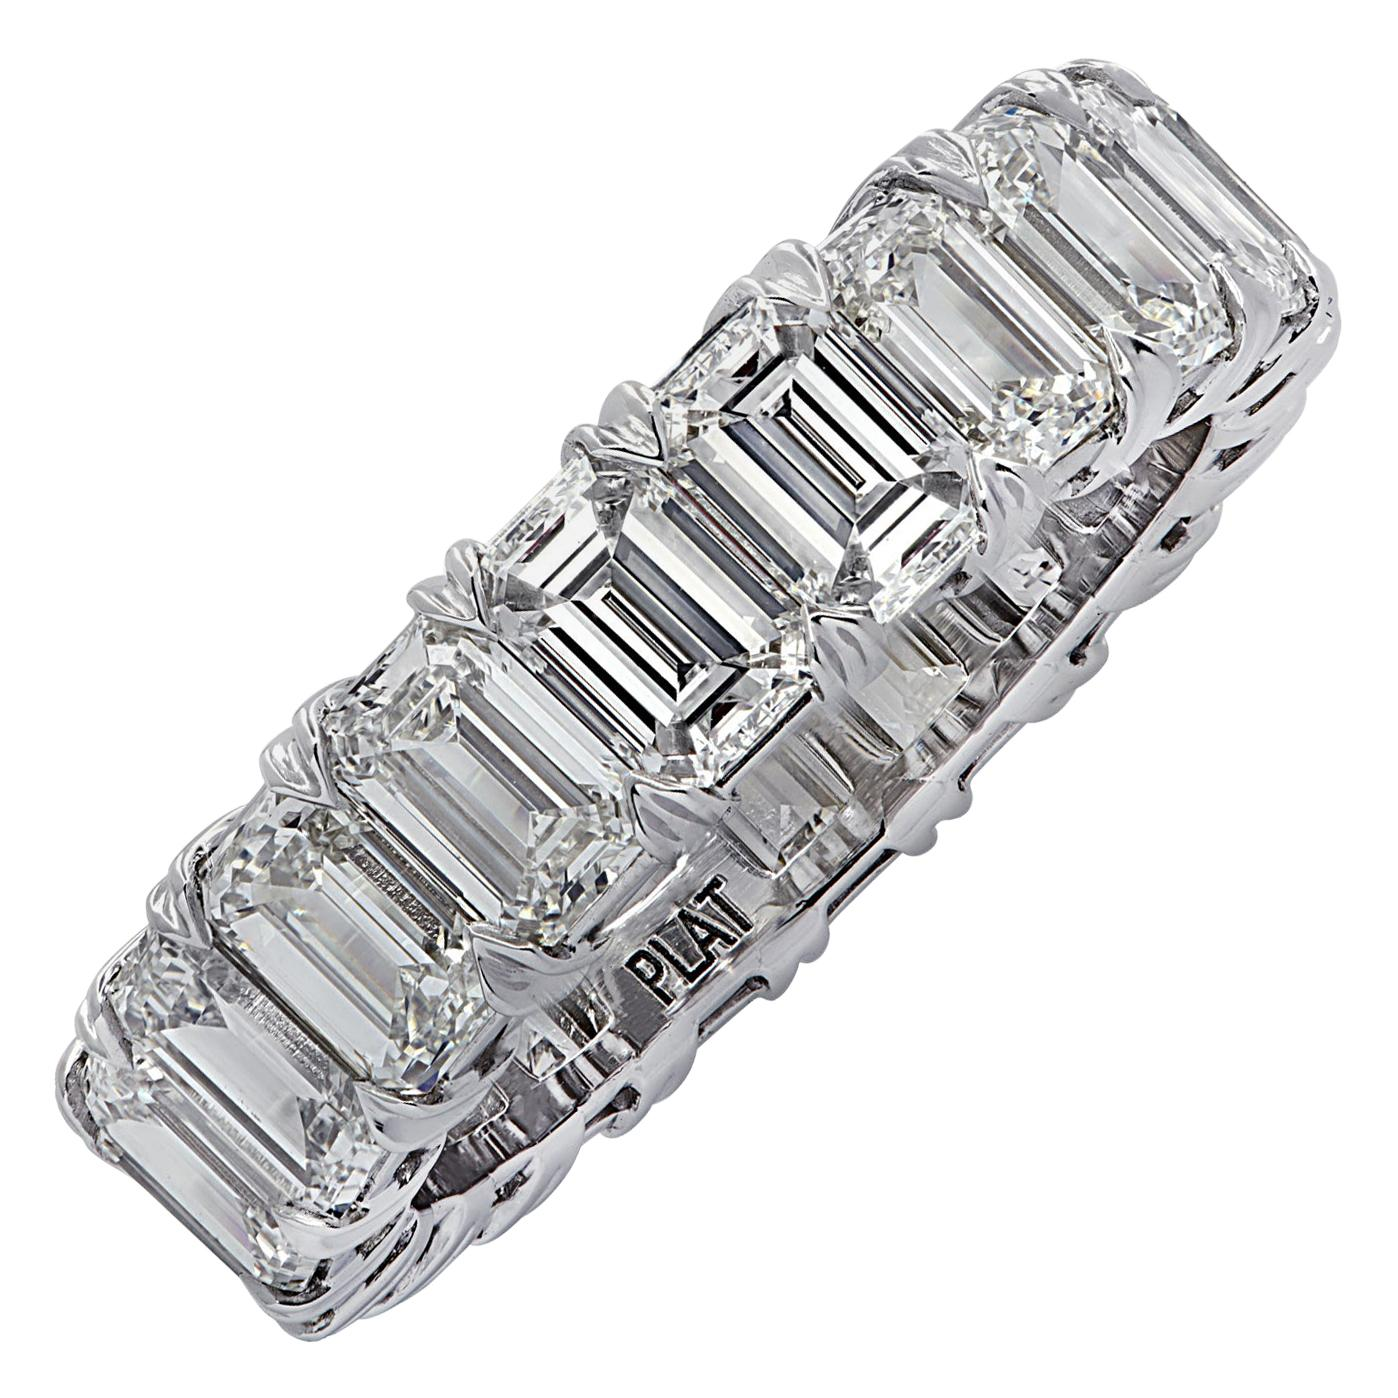 Vivid Diamonds 6.35 Carat Diamond Eternity Band